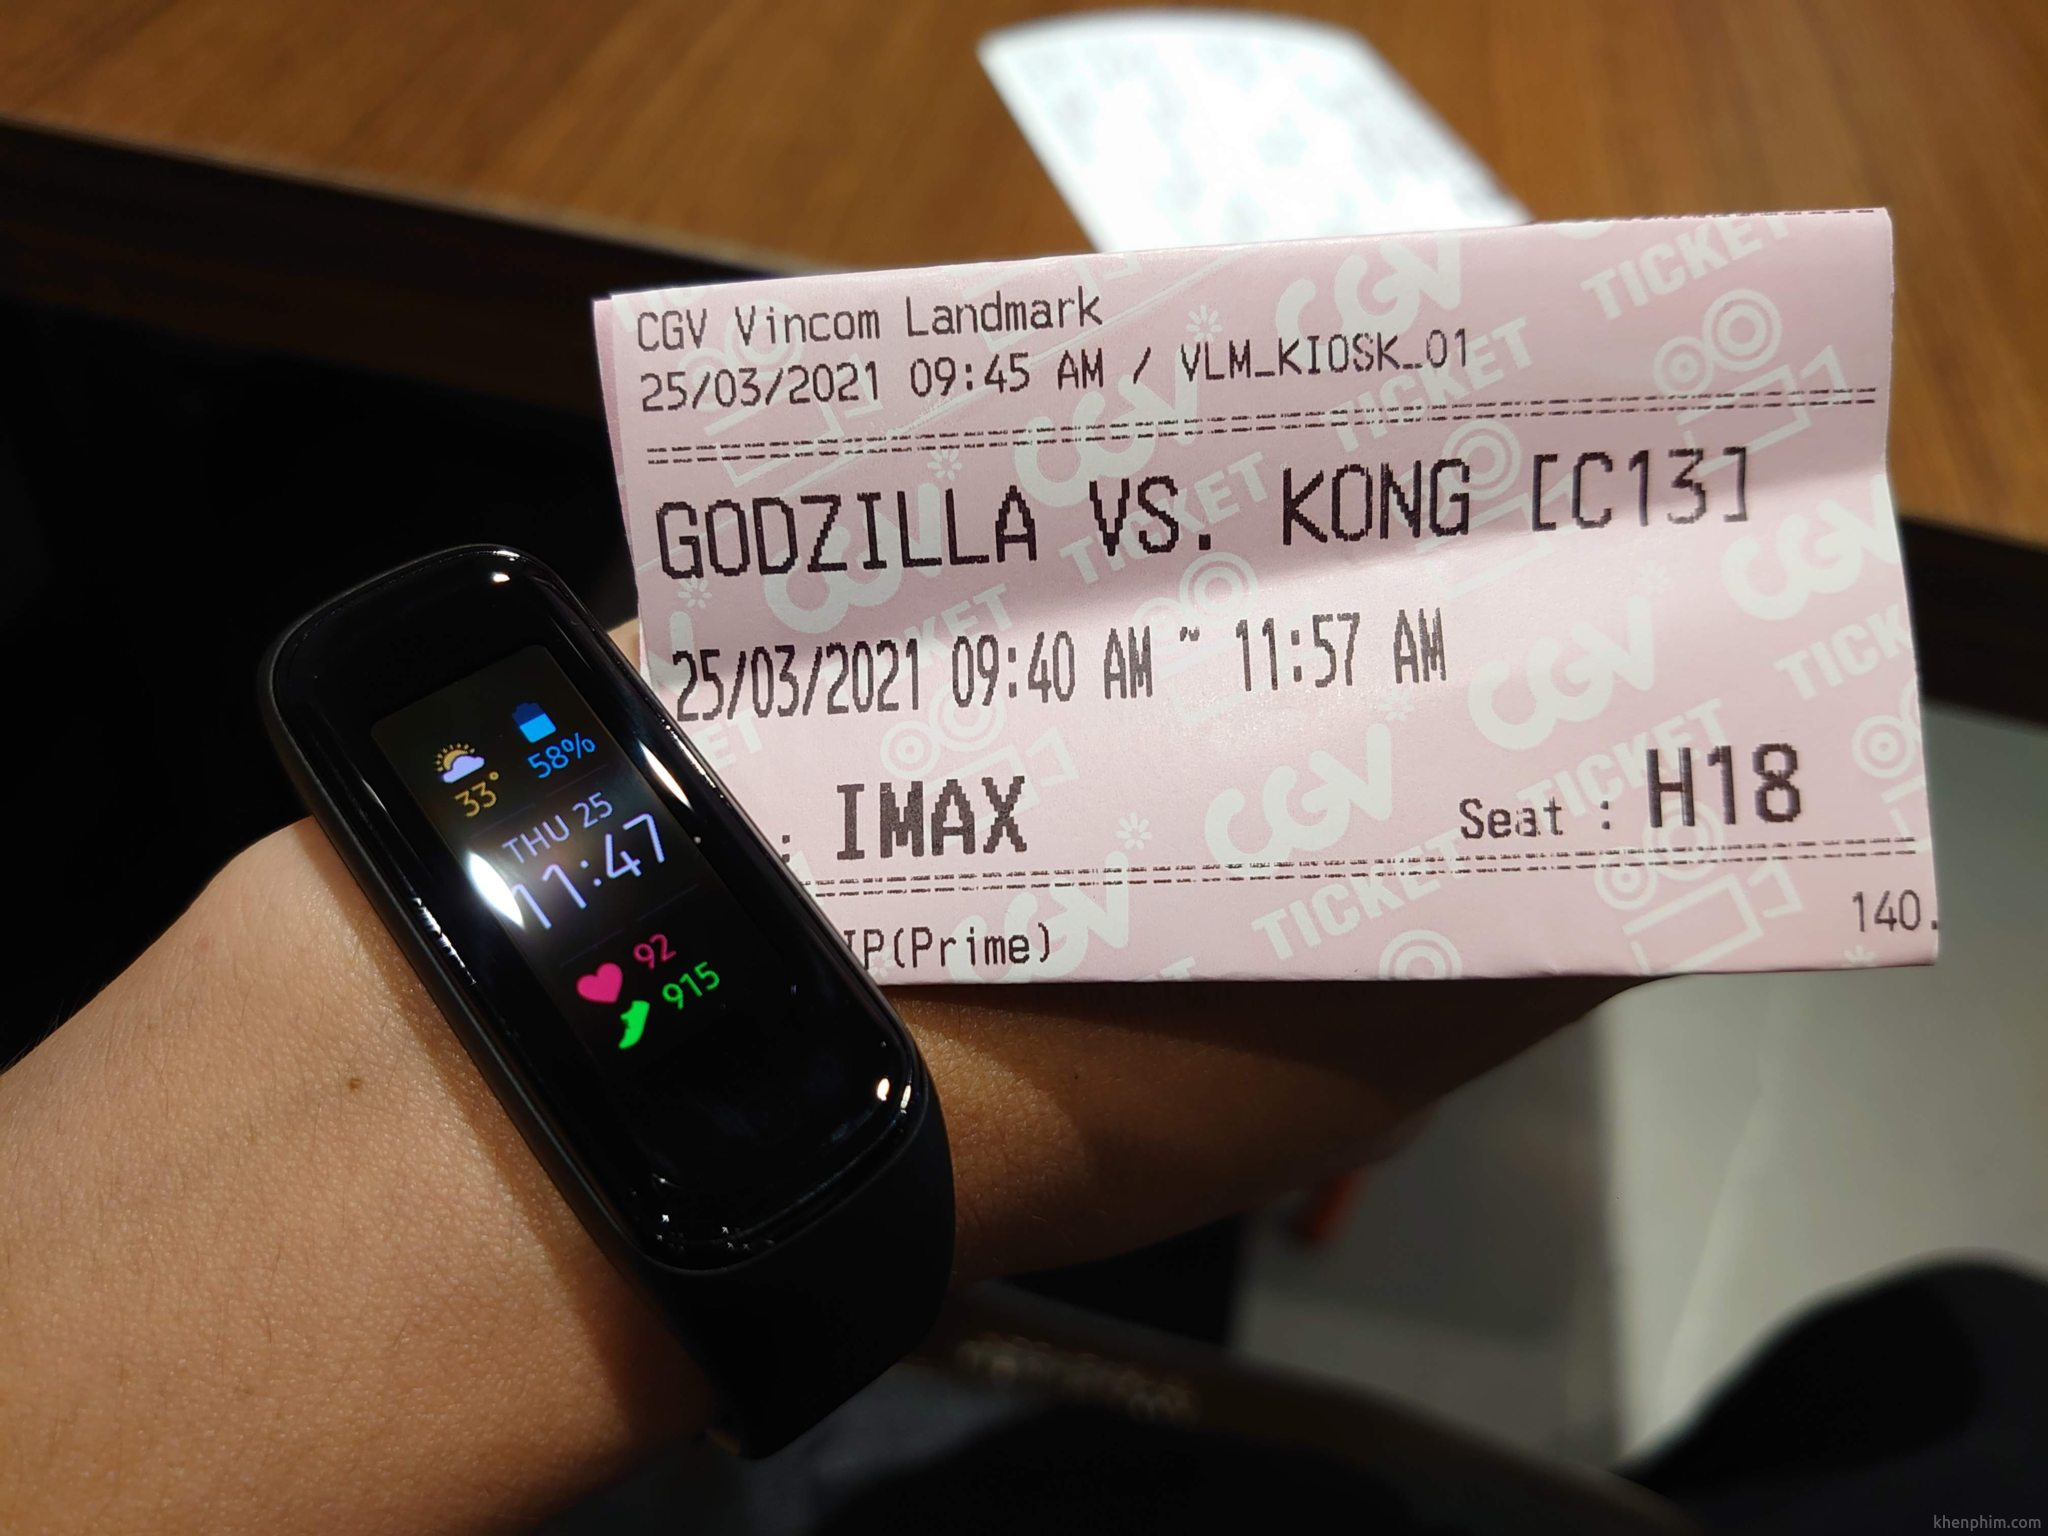 Vé xem phim Godzilla vs. Kong